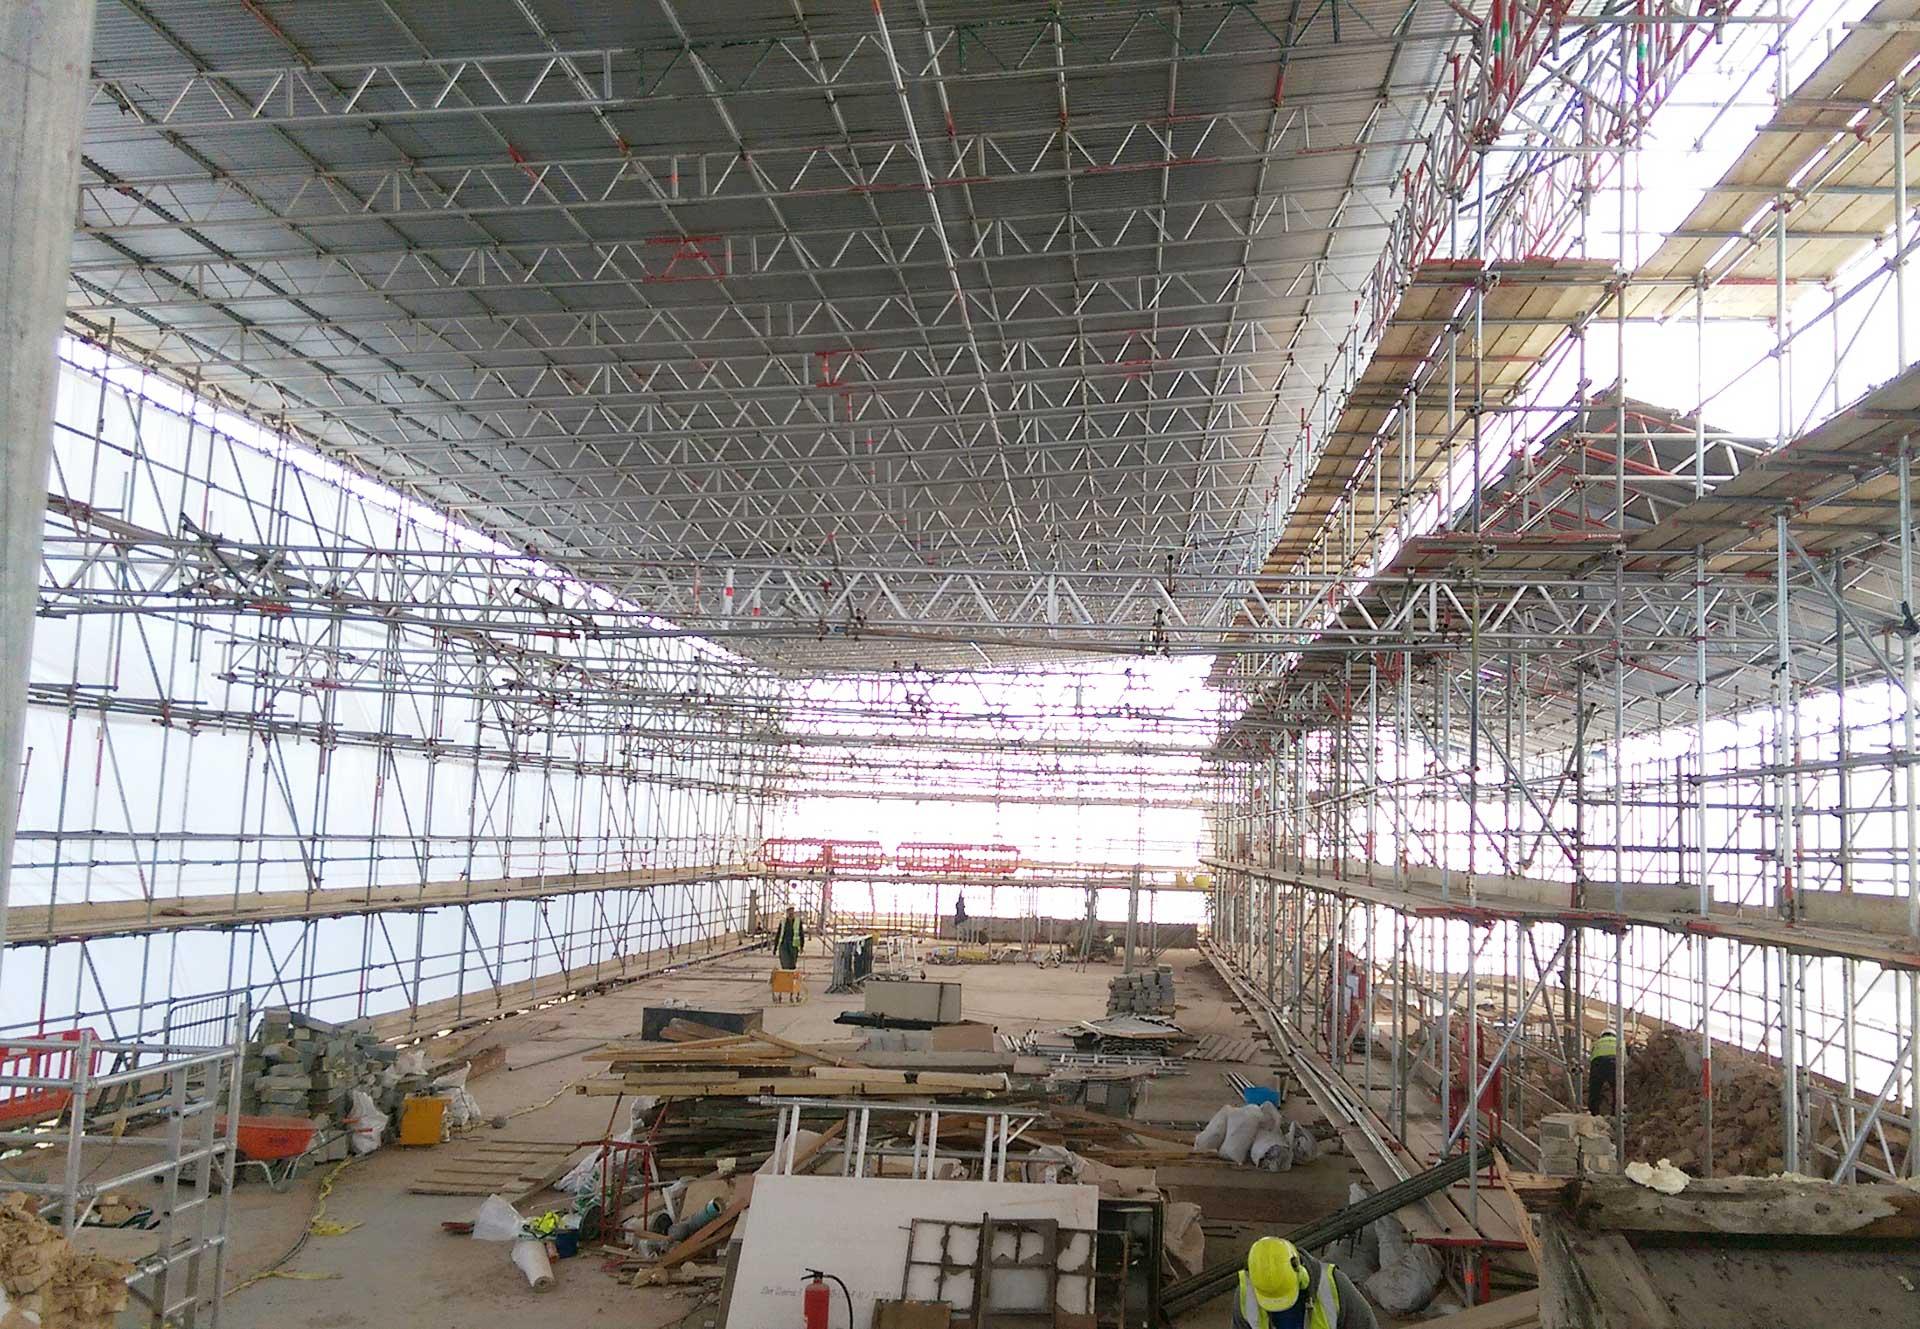 Specialist scaffolding, West Norwood